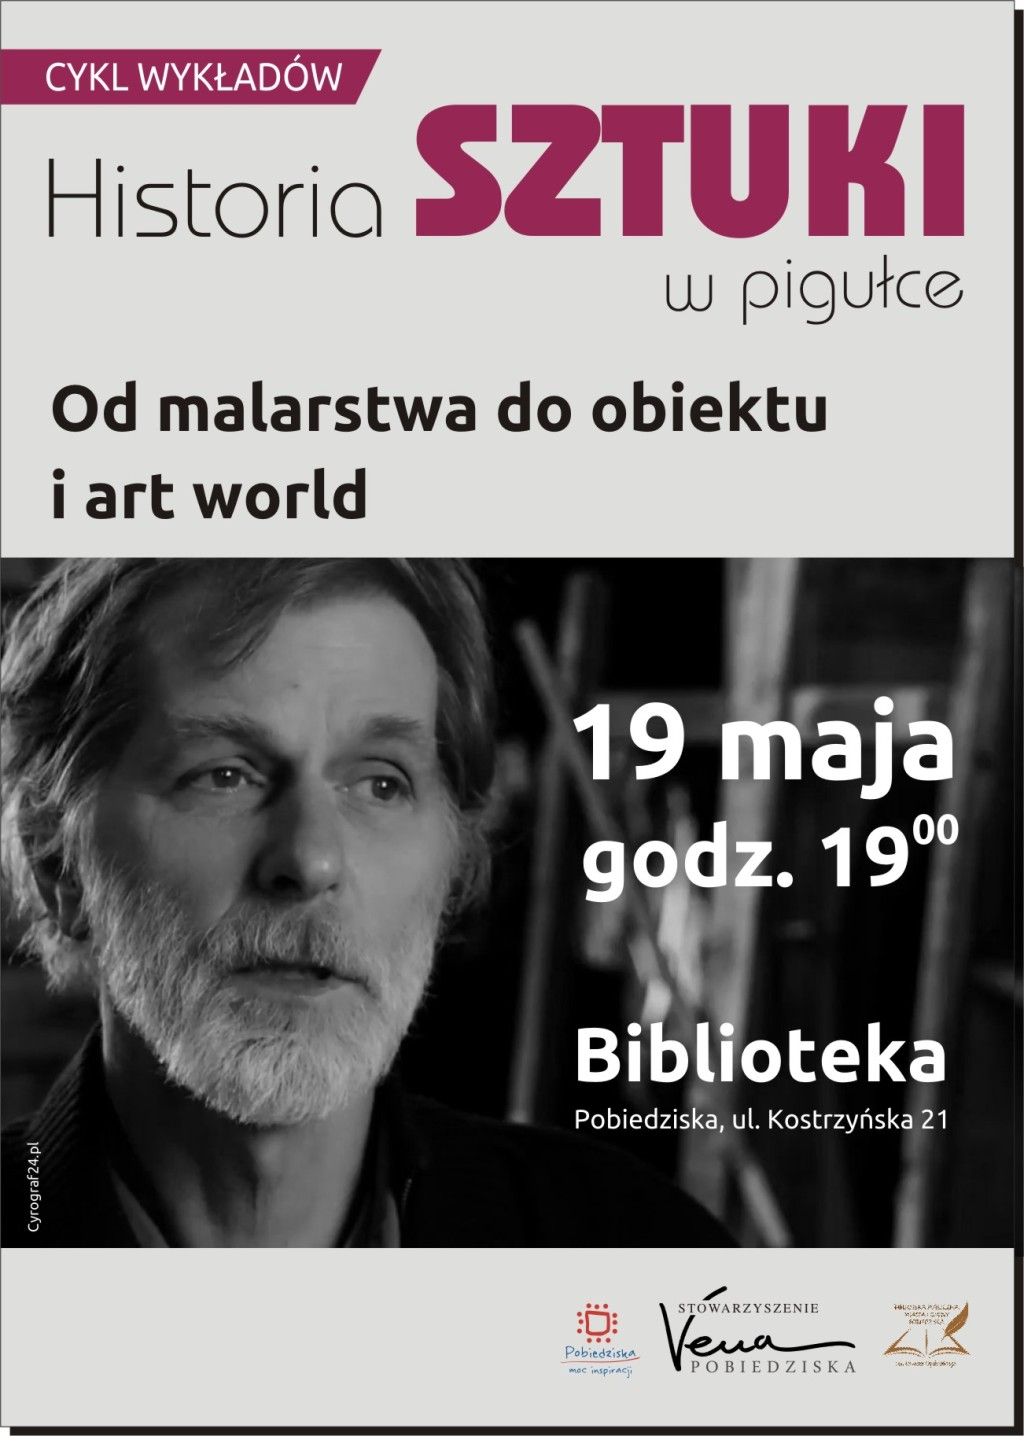 mazurek_trawinski_2